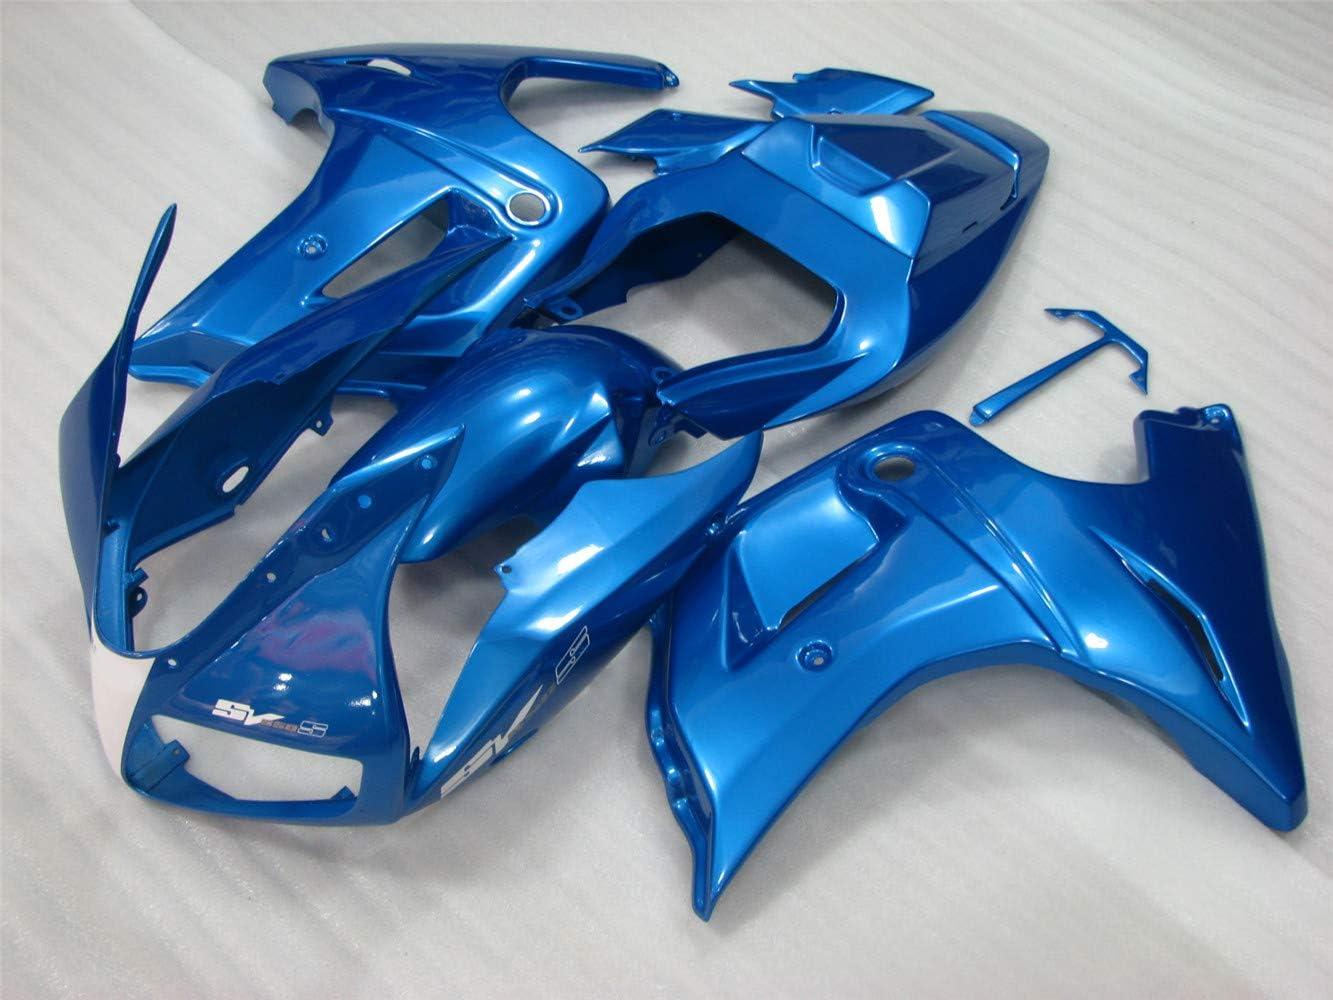 NT FAIRING Silver Fairing Fit for SUZUKI 2003-2008 SV650 New ABS Plastics Bodywork Body Kit Bodyframe Body Work